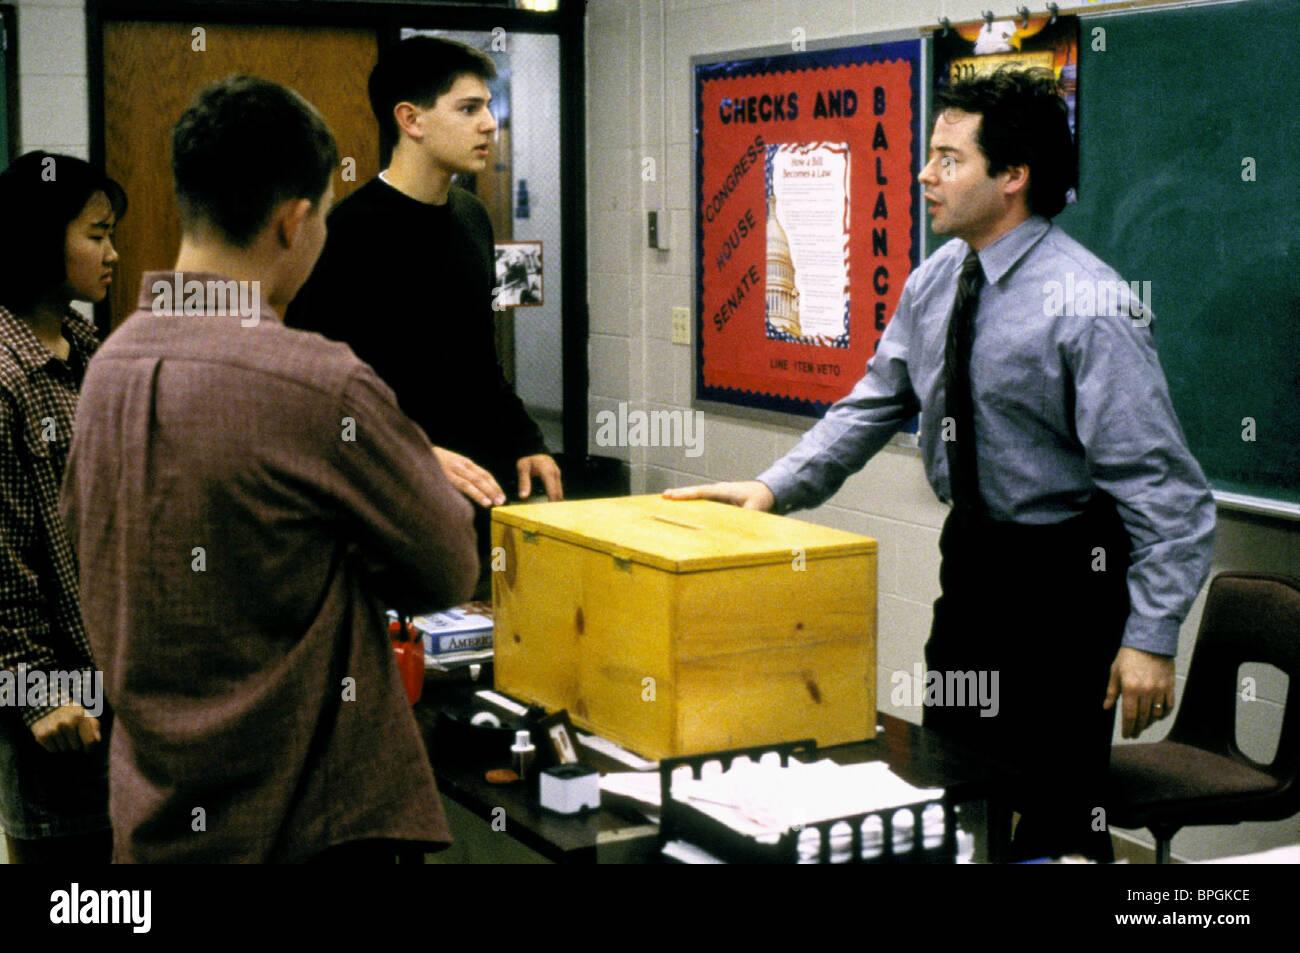 MATTHEW BRODERICK ELECTION (1999) - Stock Image